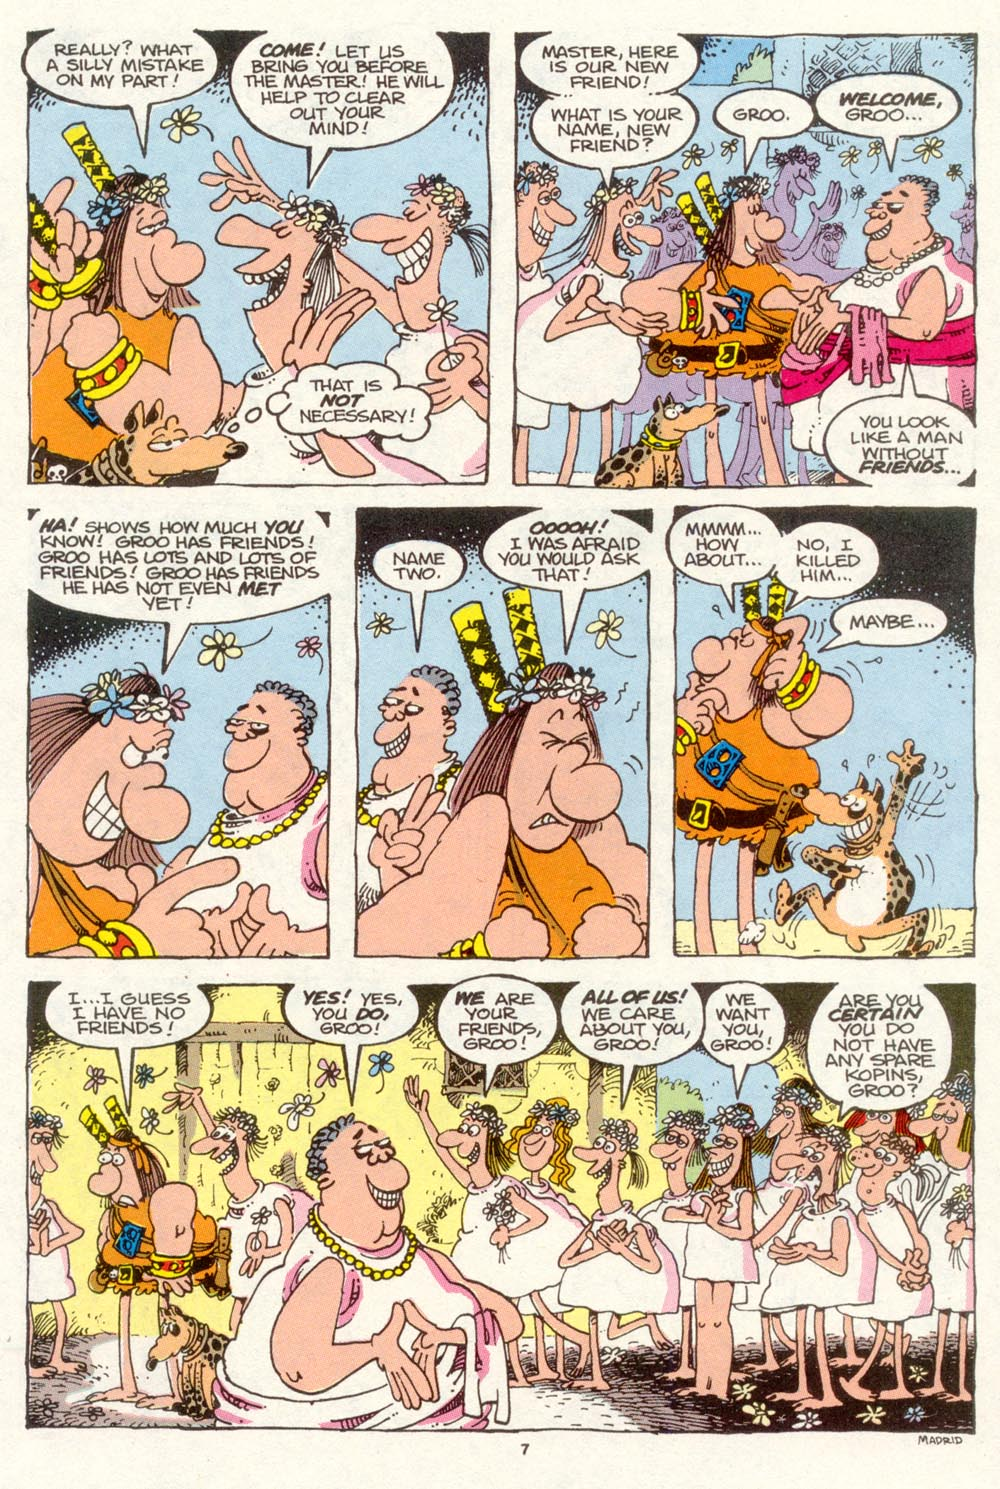 Read online Sergio Aragonés Groo the Wanderer comic -  Issue #89 - 8